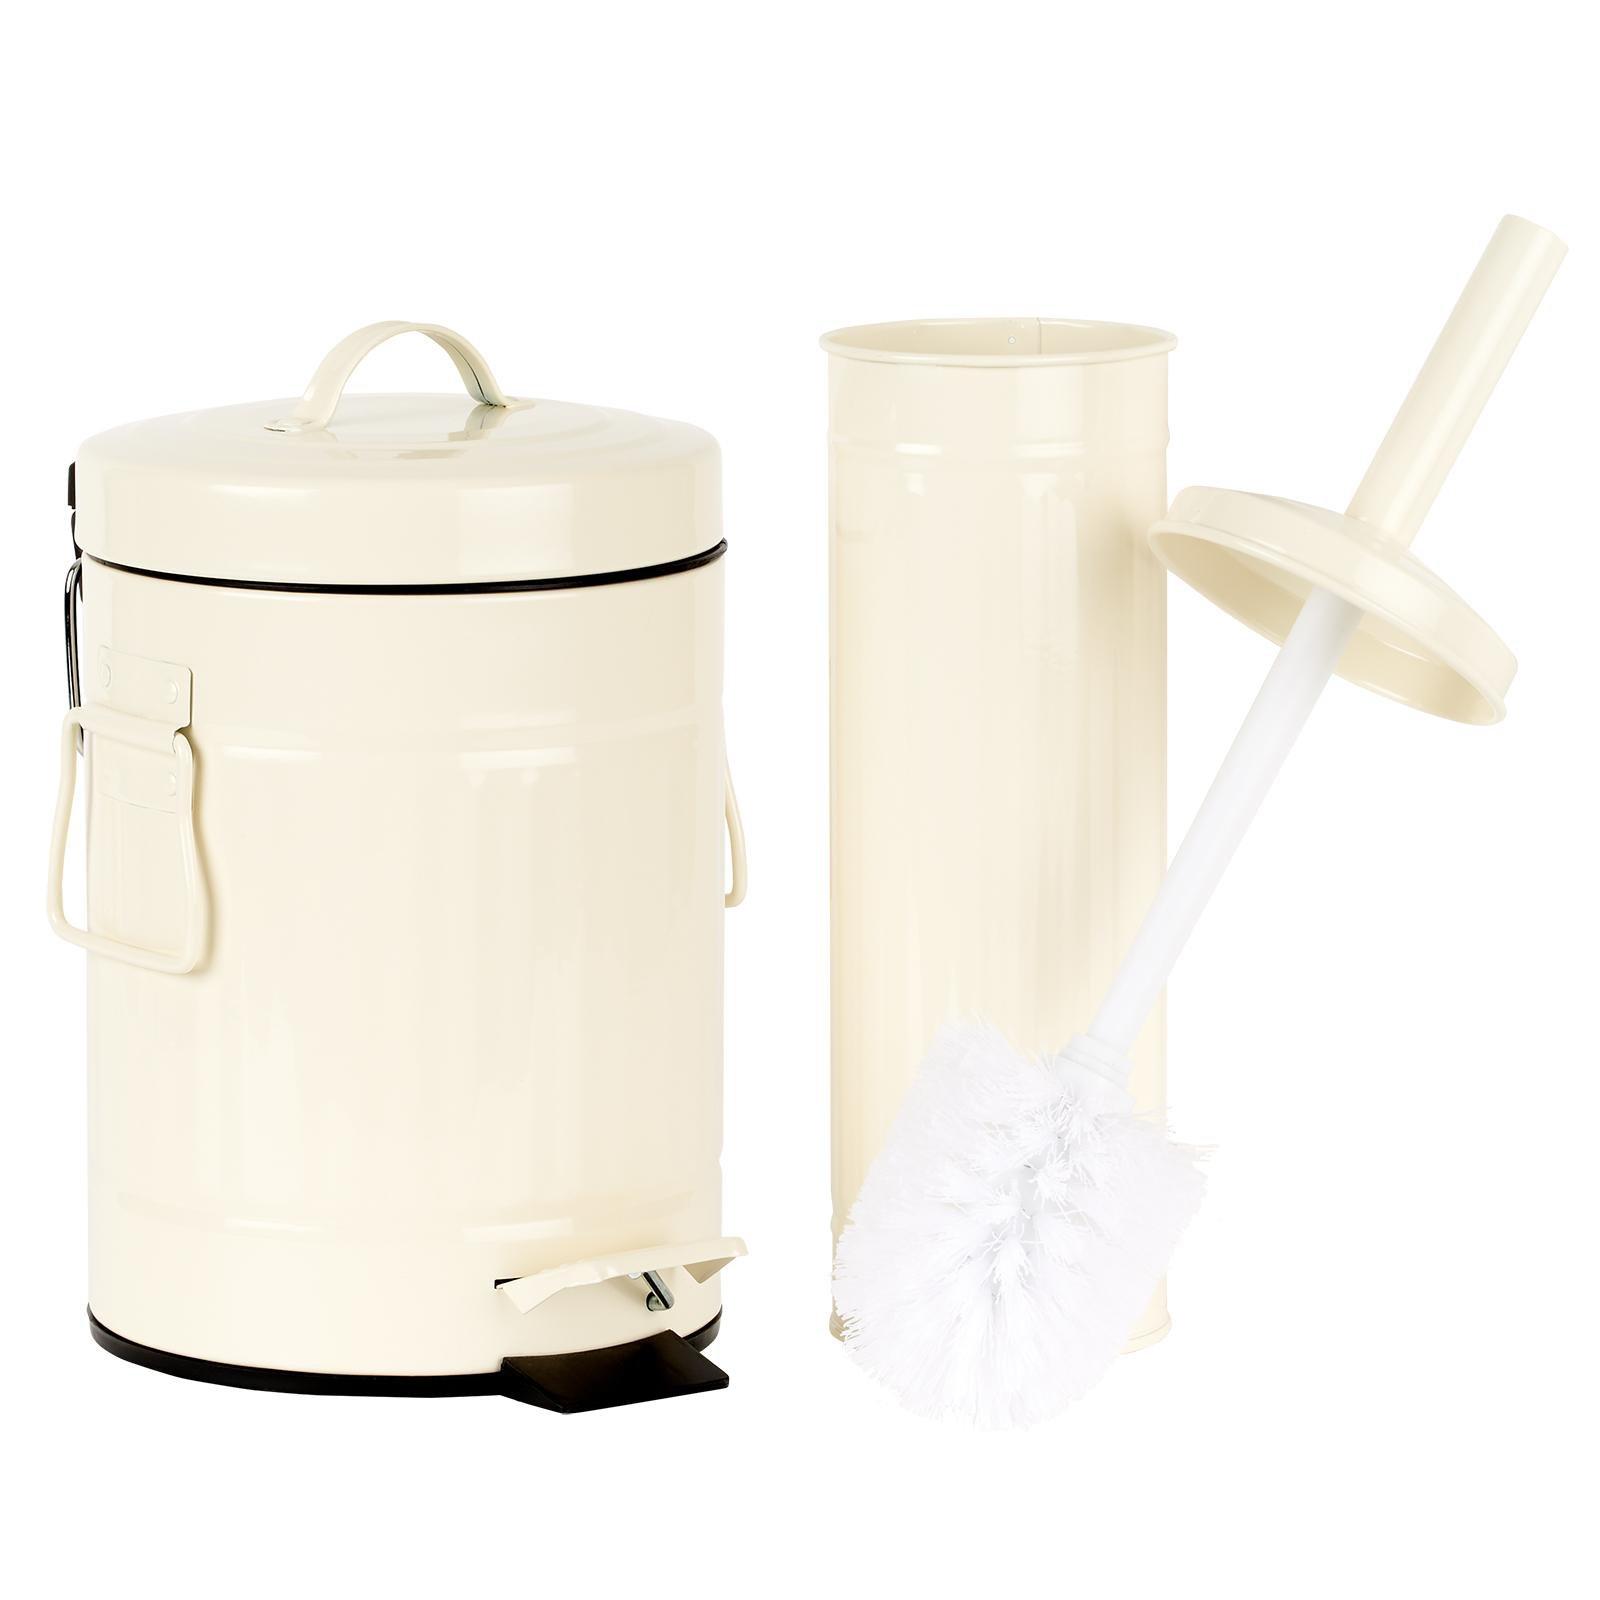 image-Hartleys Retro Metal Cream Pedal Bin & Toilet Brush Set